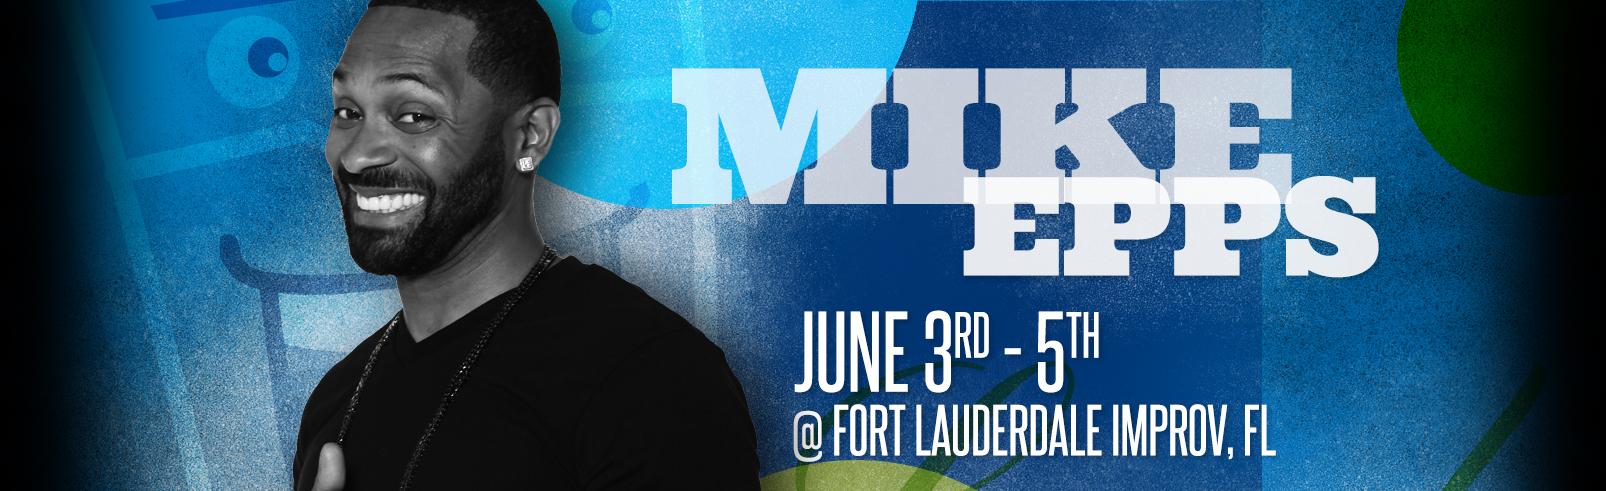 Mike Epps @ Fort Lauderdale Improv